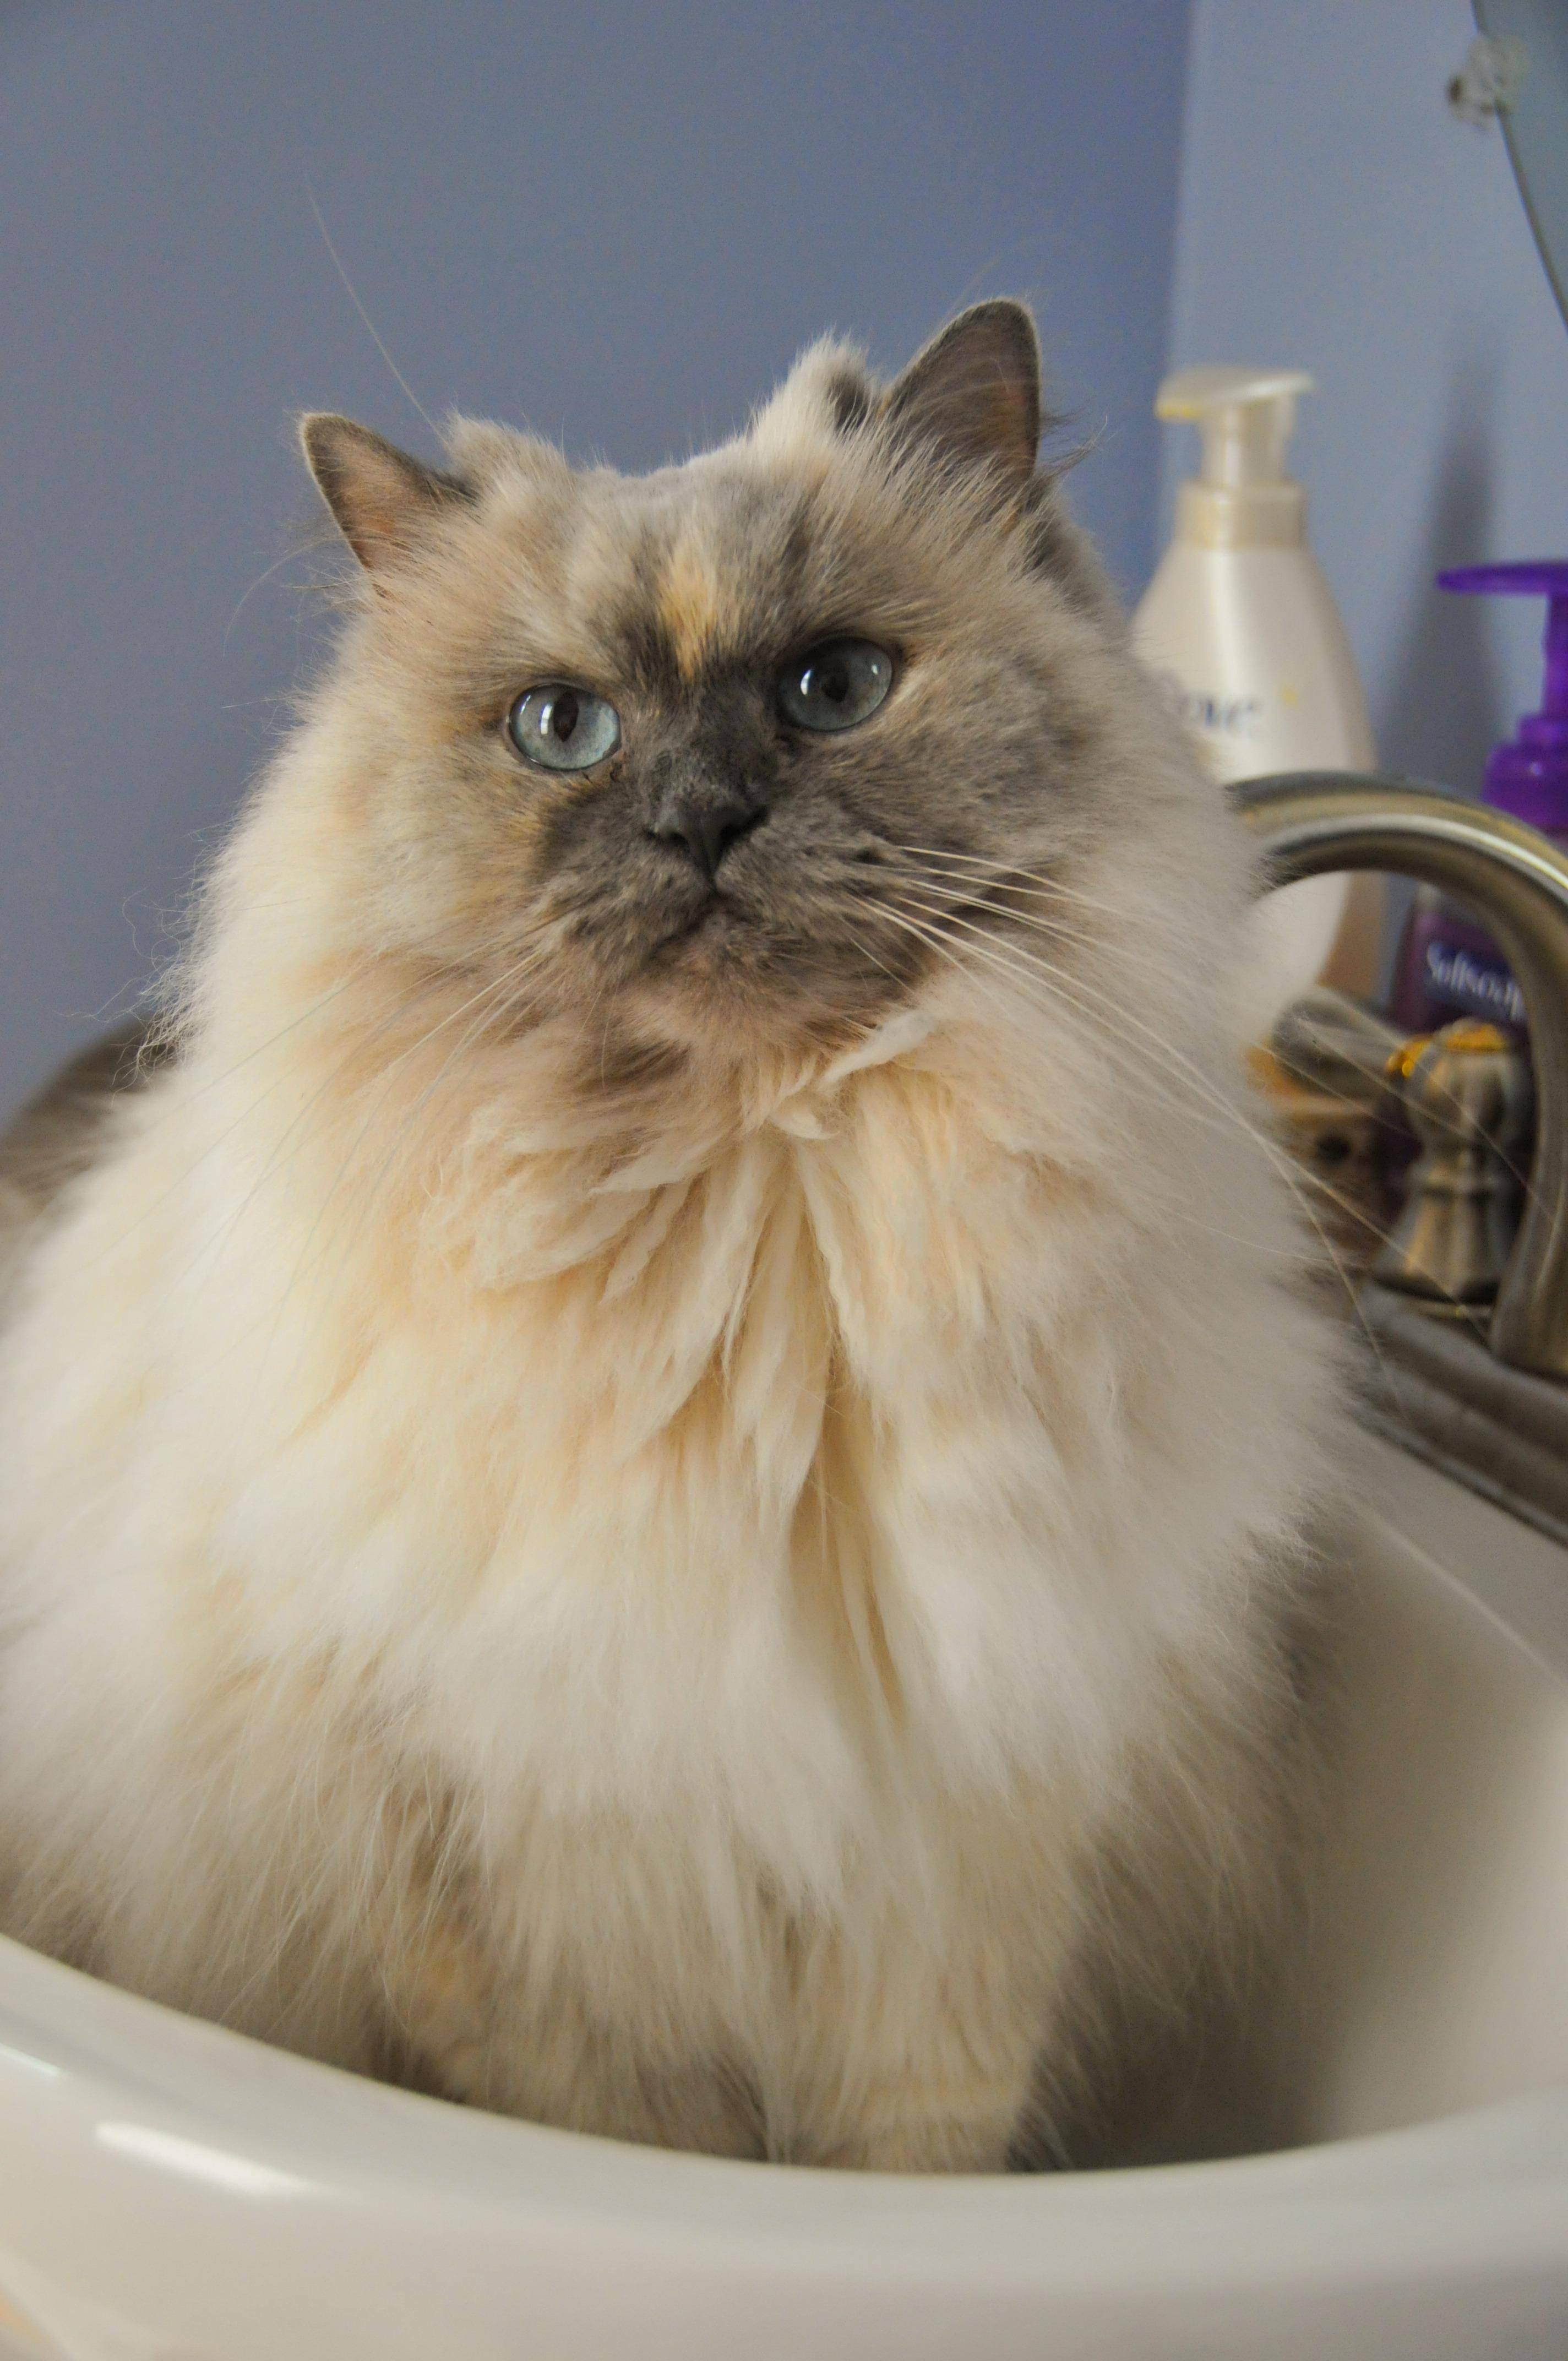 Free Images : cute, pet, fur, fluffy, kitten, tabby, sink, playful ...